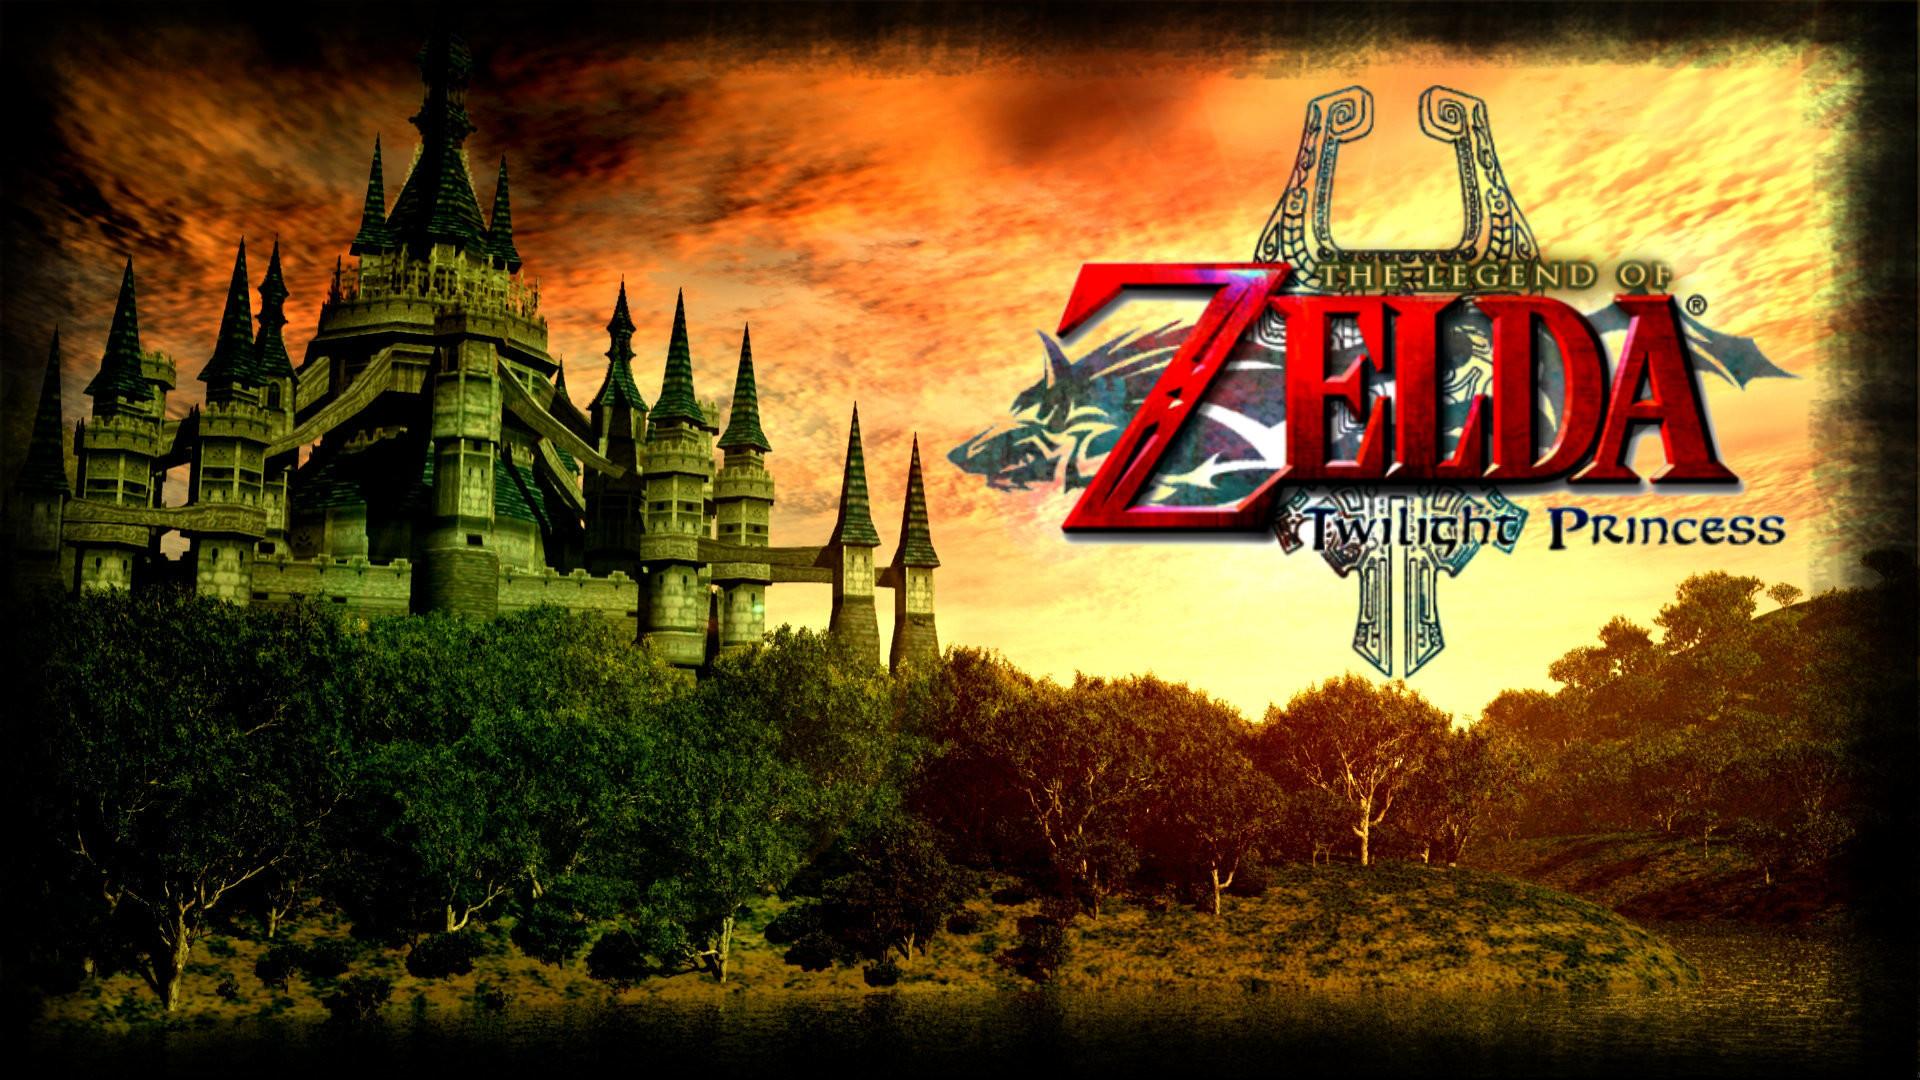 .deviantart.com/art/Zelda-Twilight-Princess-